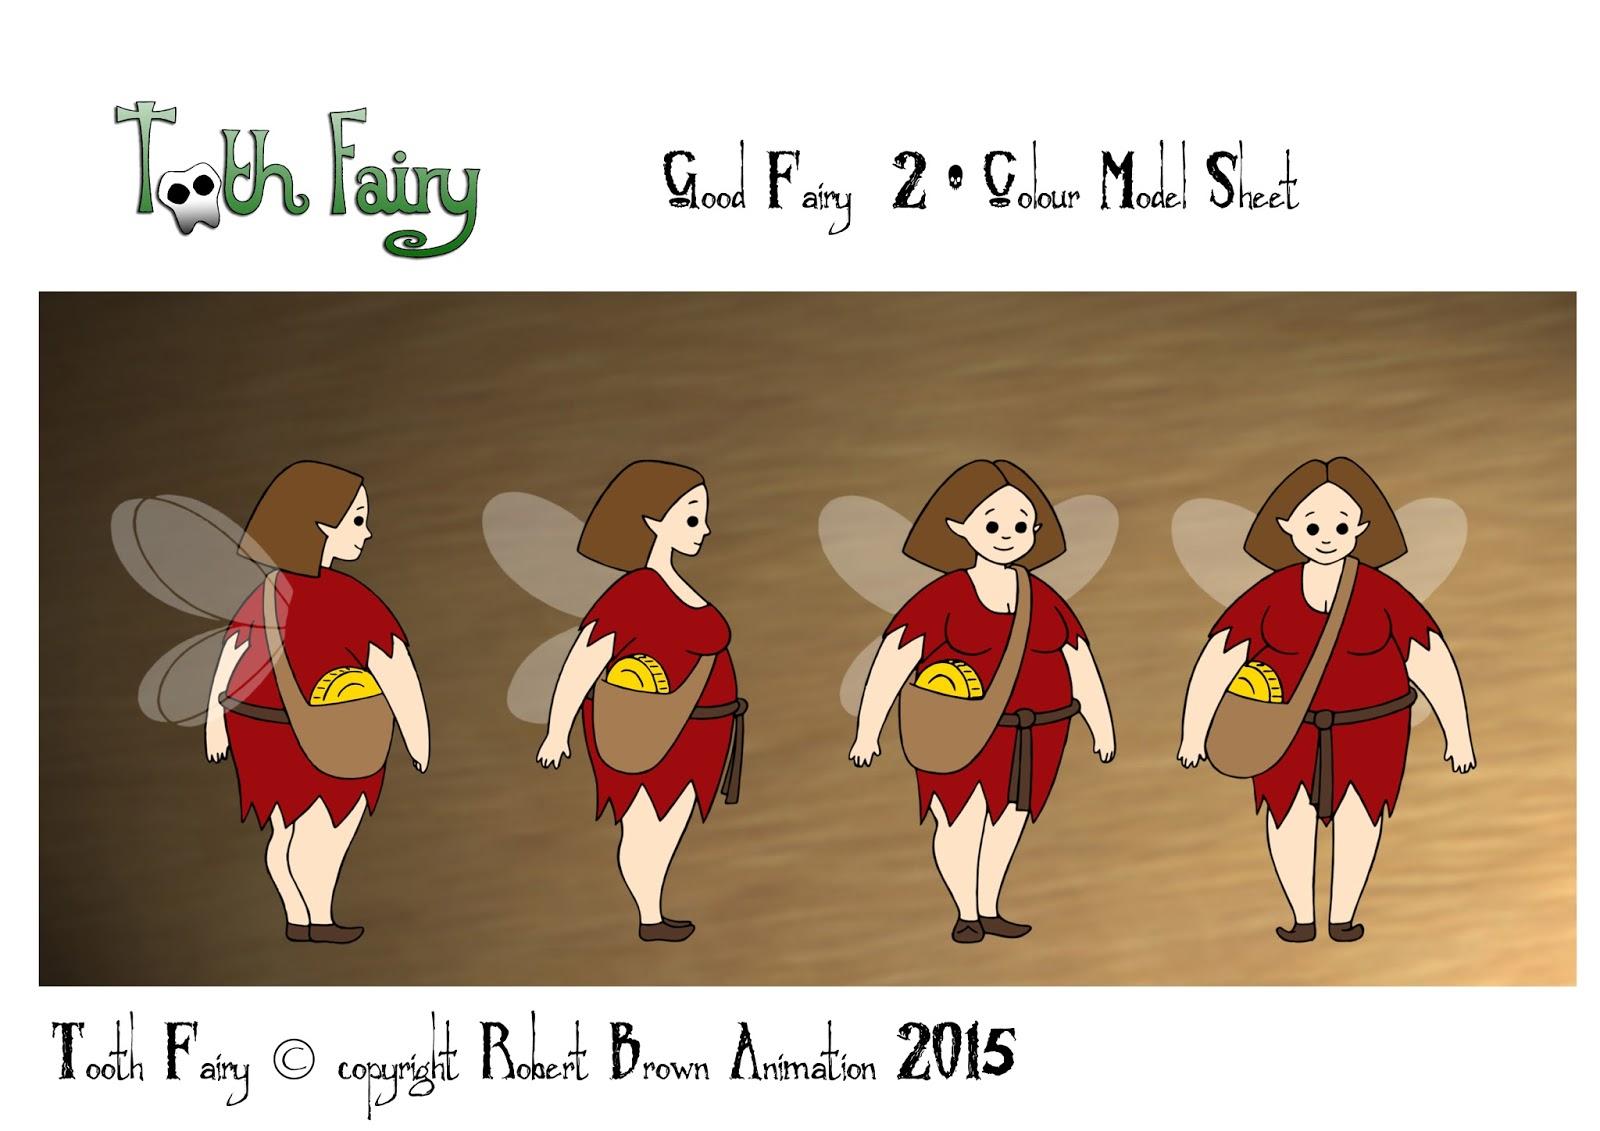 robert brown animation u0027tooth fairy u0027 character model sheets